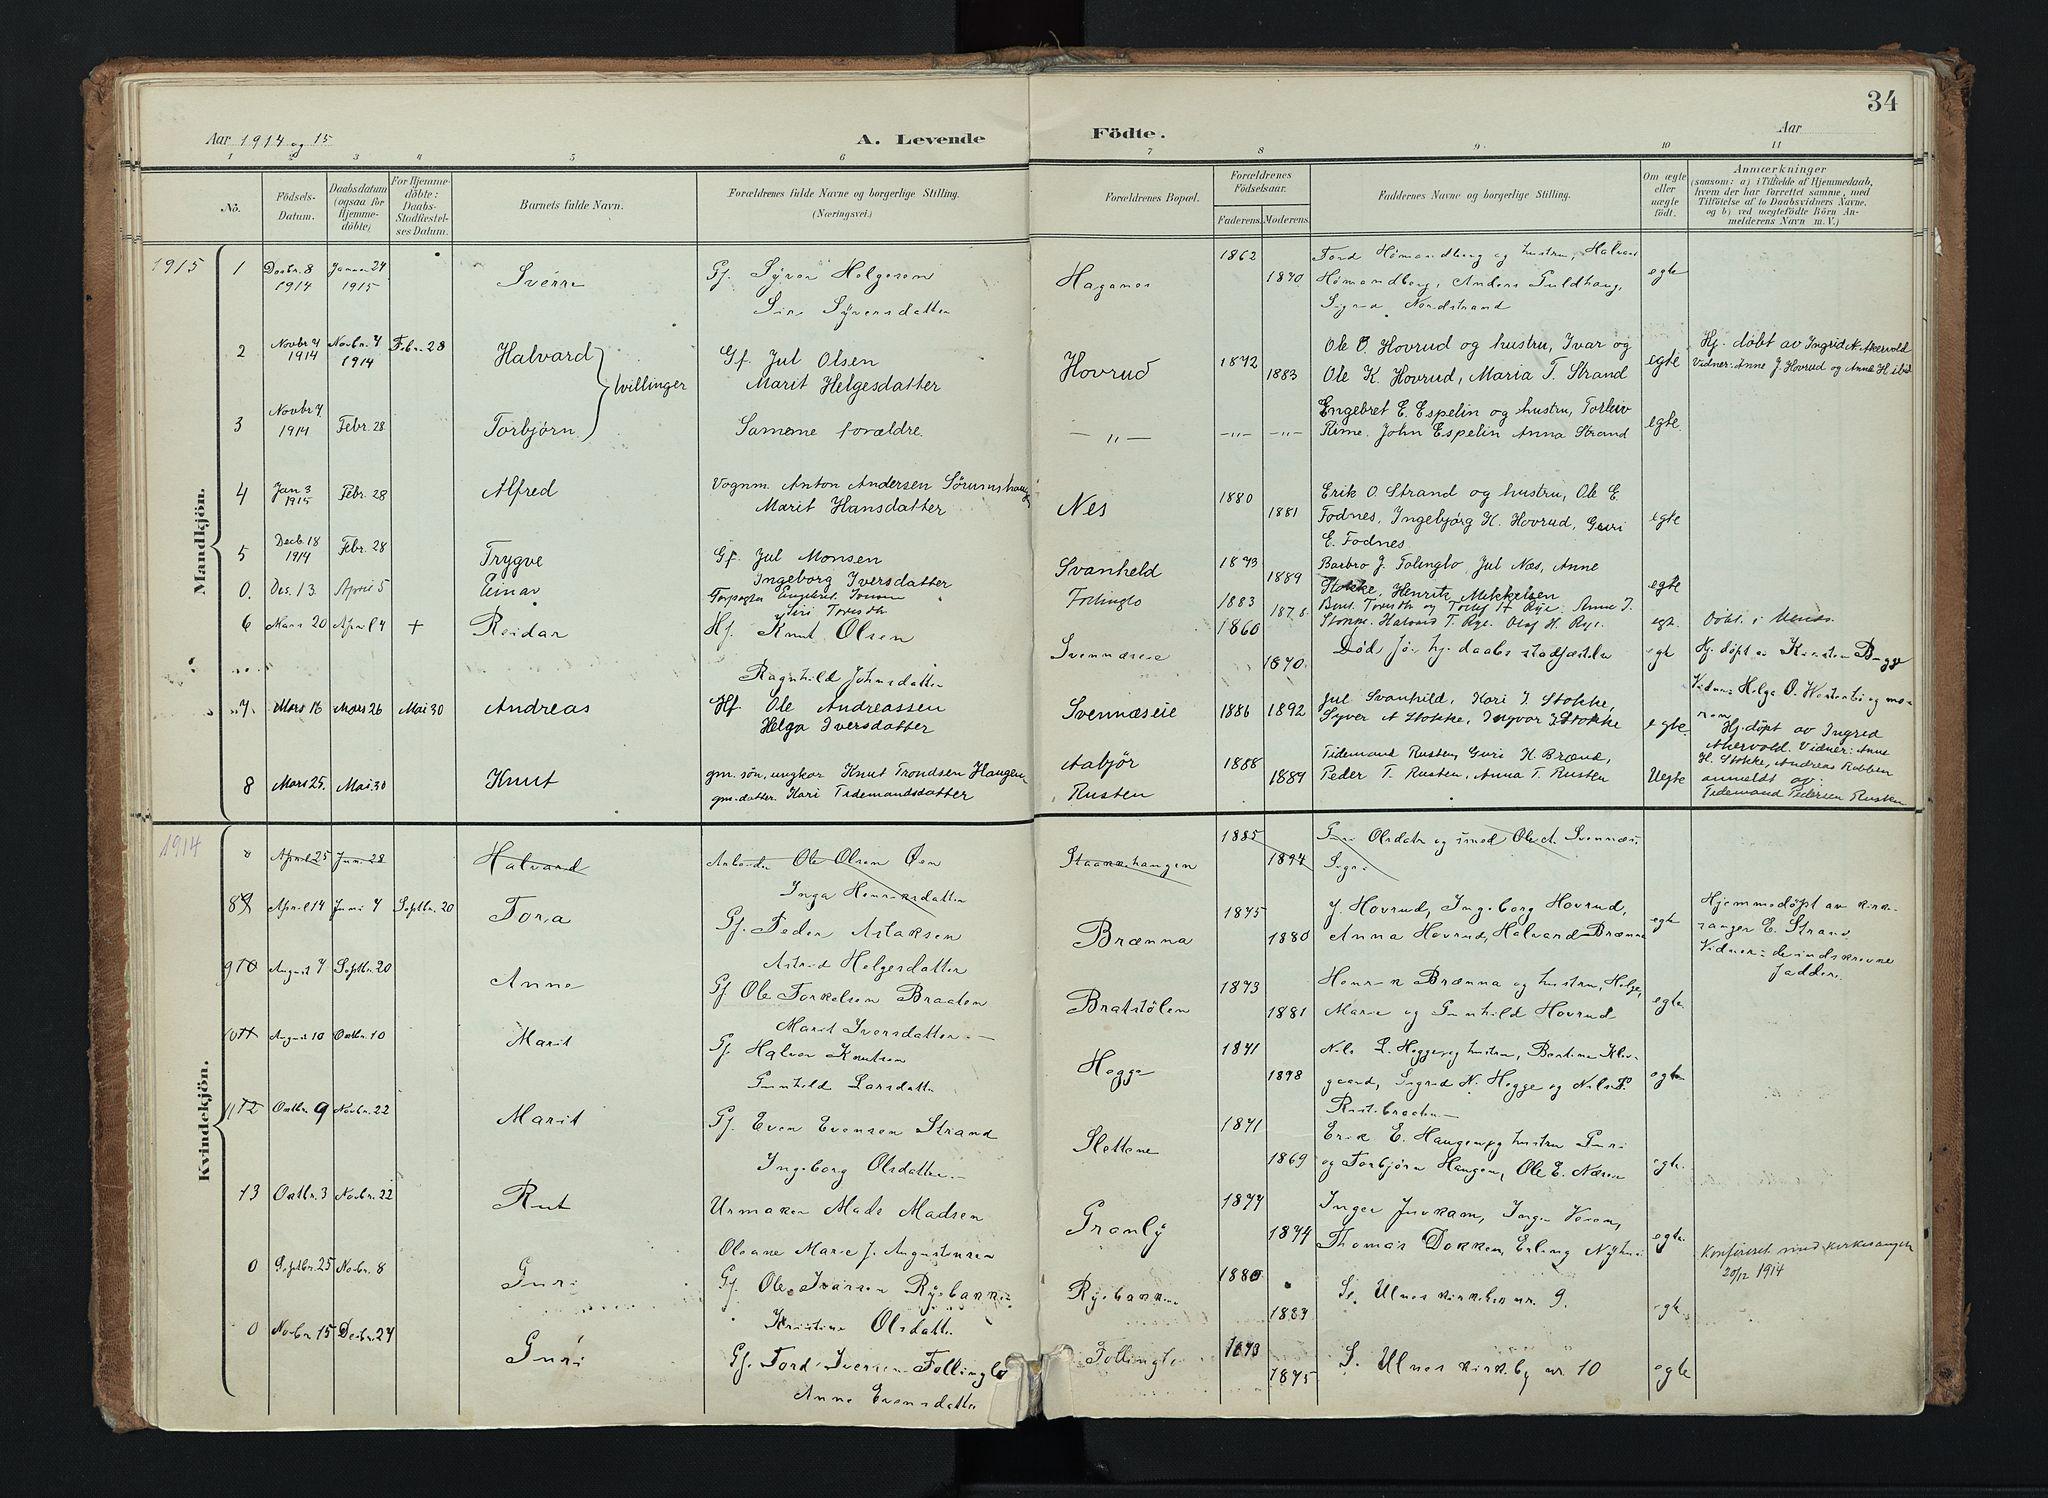 SAH, Nord-Aurdal prestekontor, Ministerialbok nr. 16, 1897-1925, s. 34